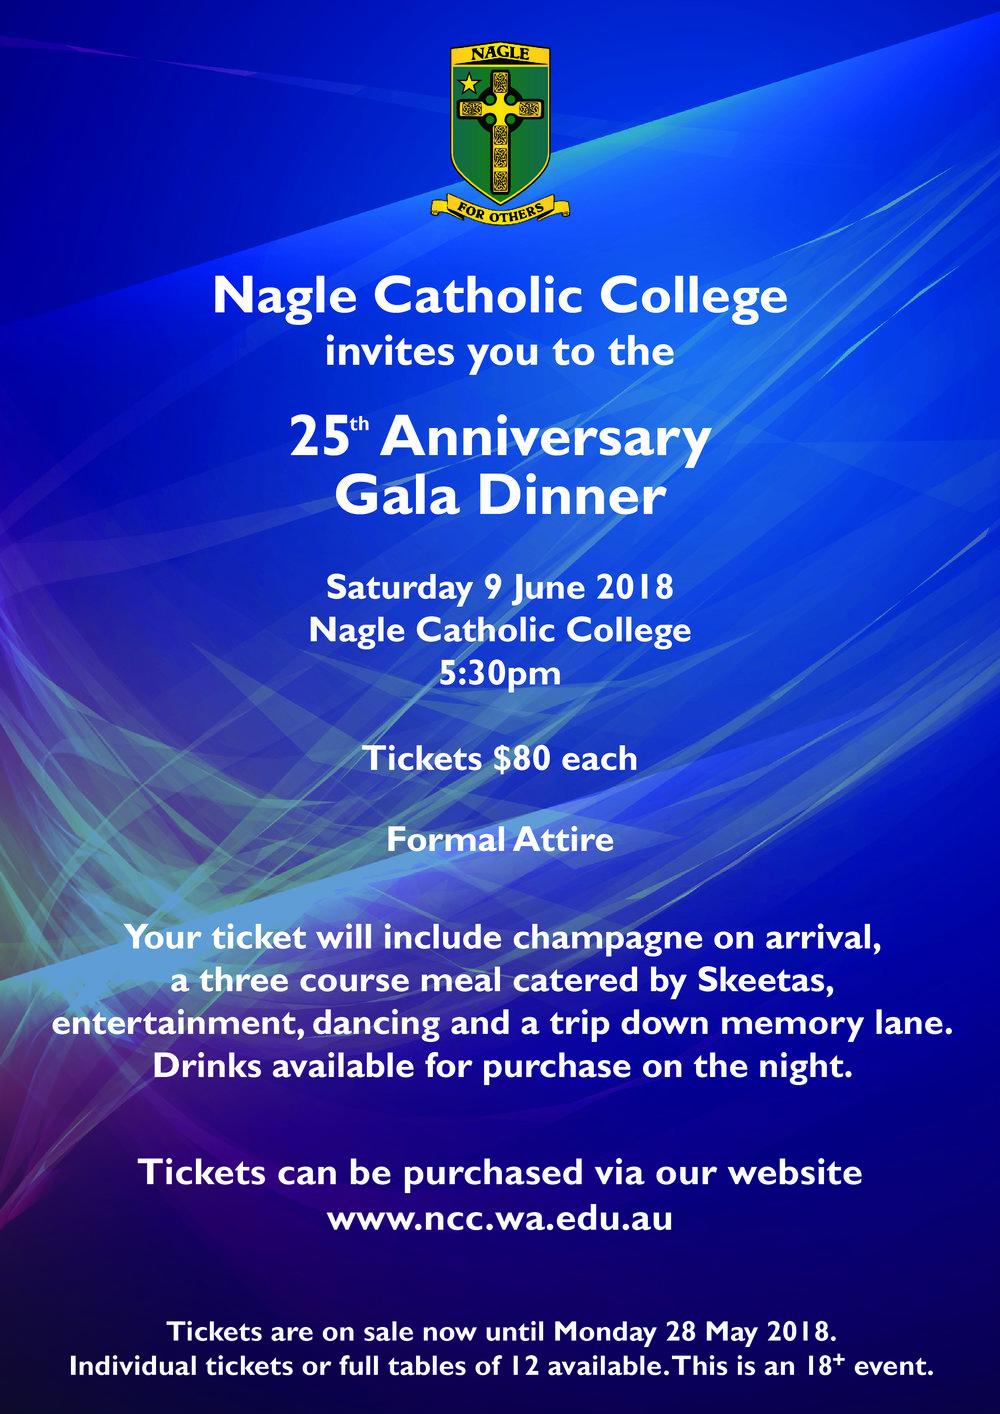 Nagle Catholic College 25th Anniversary Gala Dinner Everything